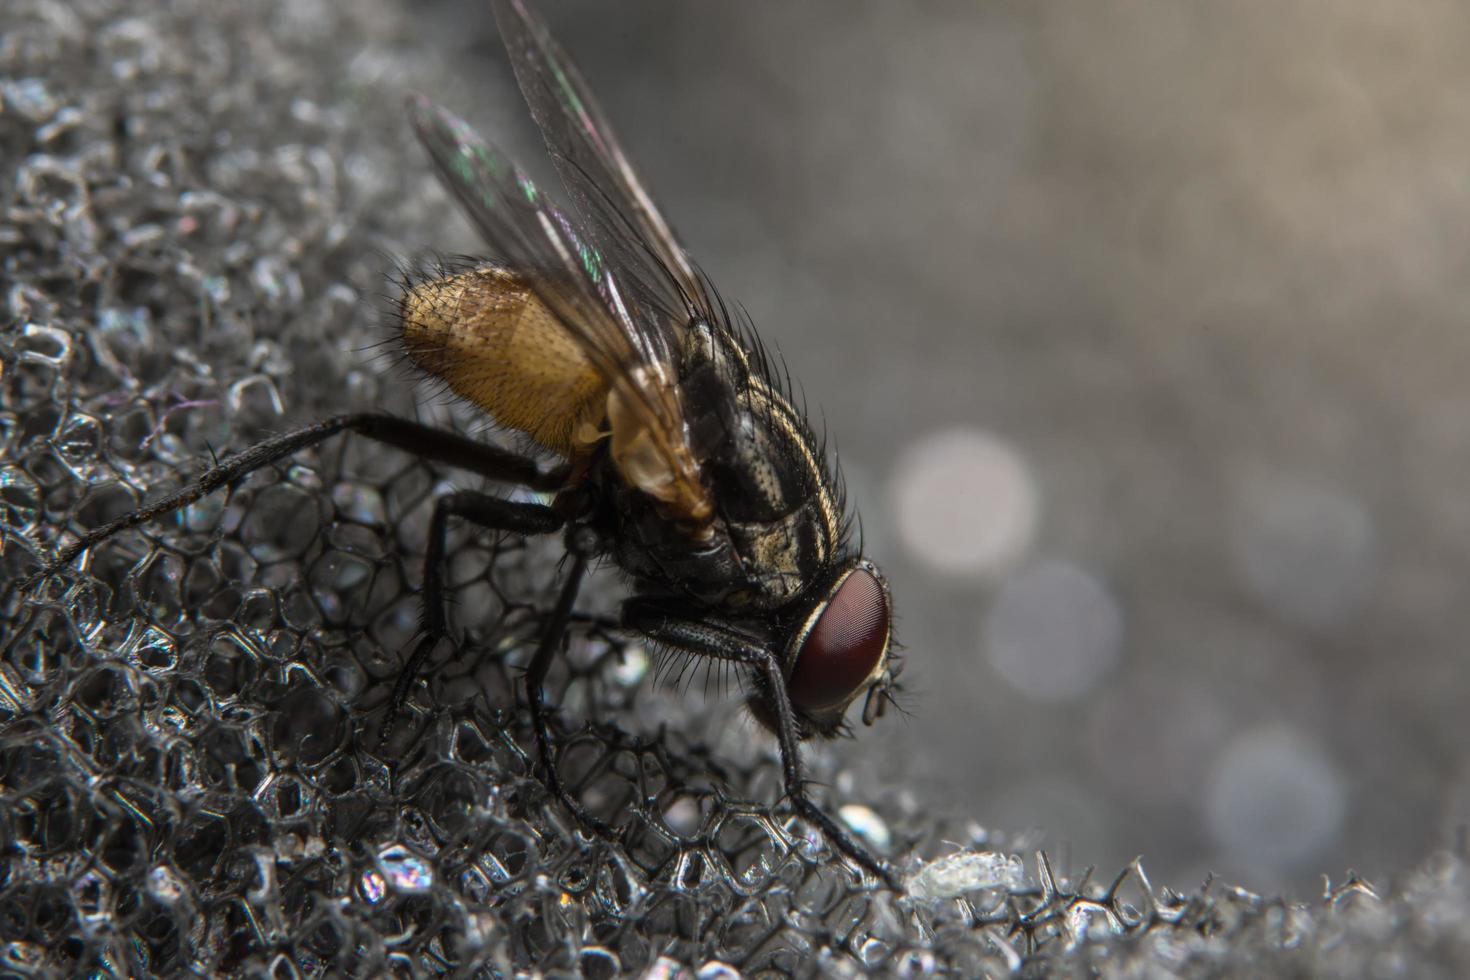 Diptera fliegen Nahaufnahme foto